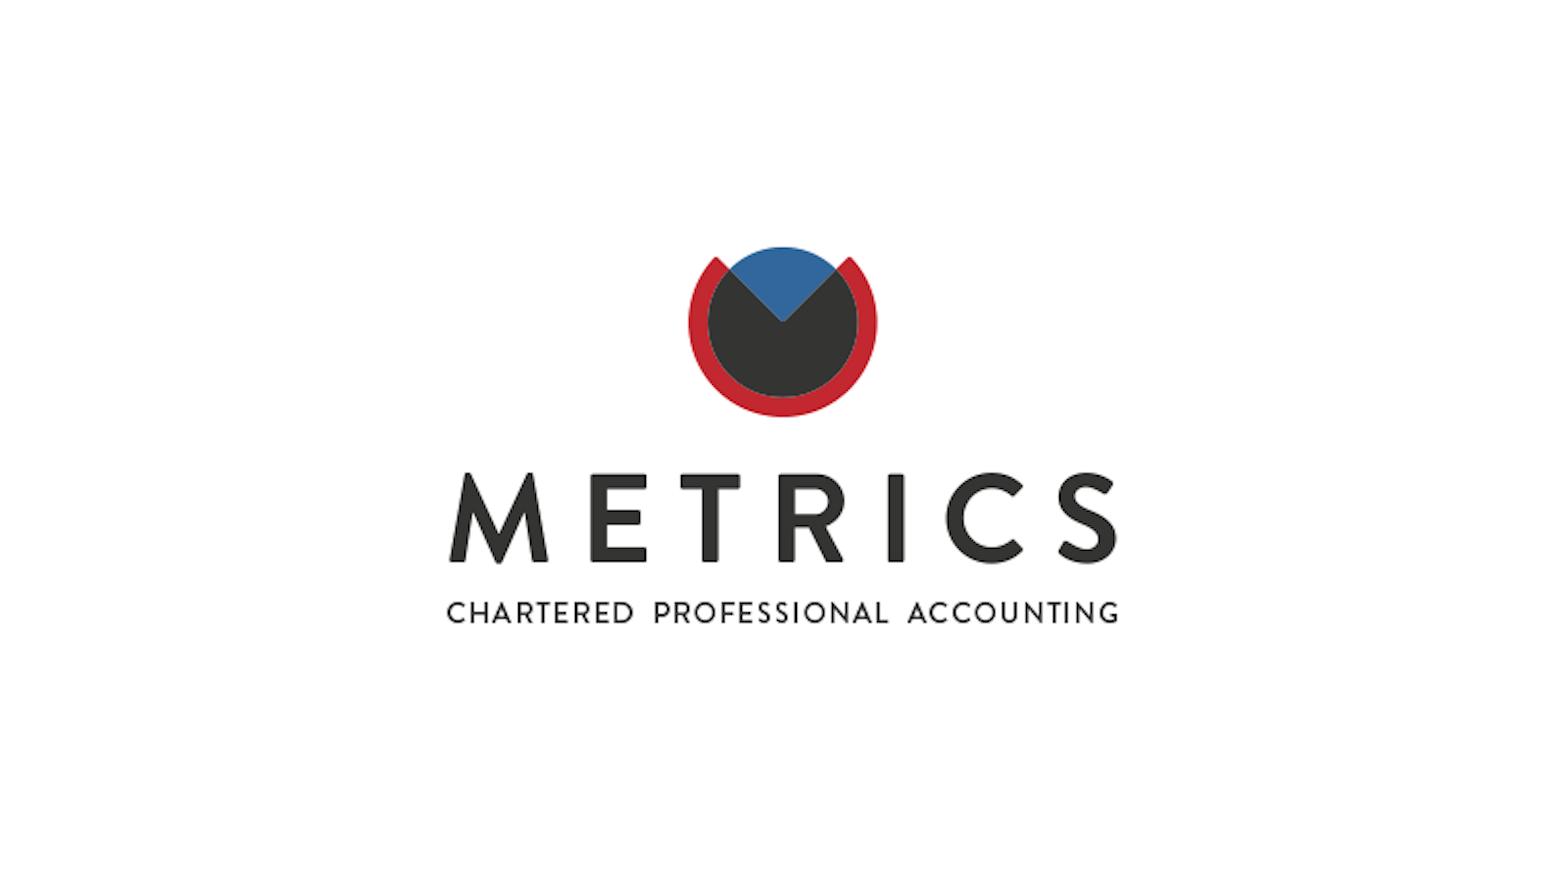 The Metrics logo